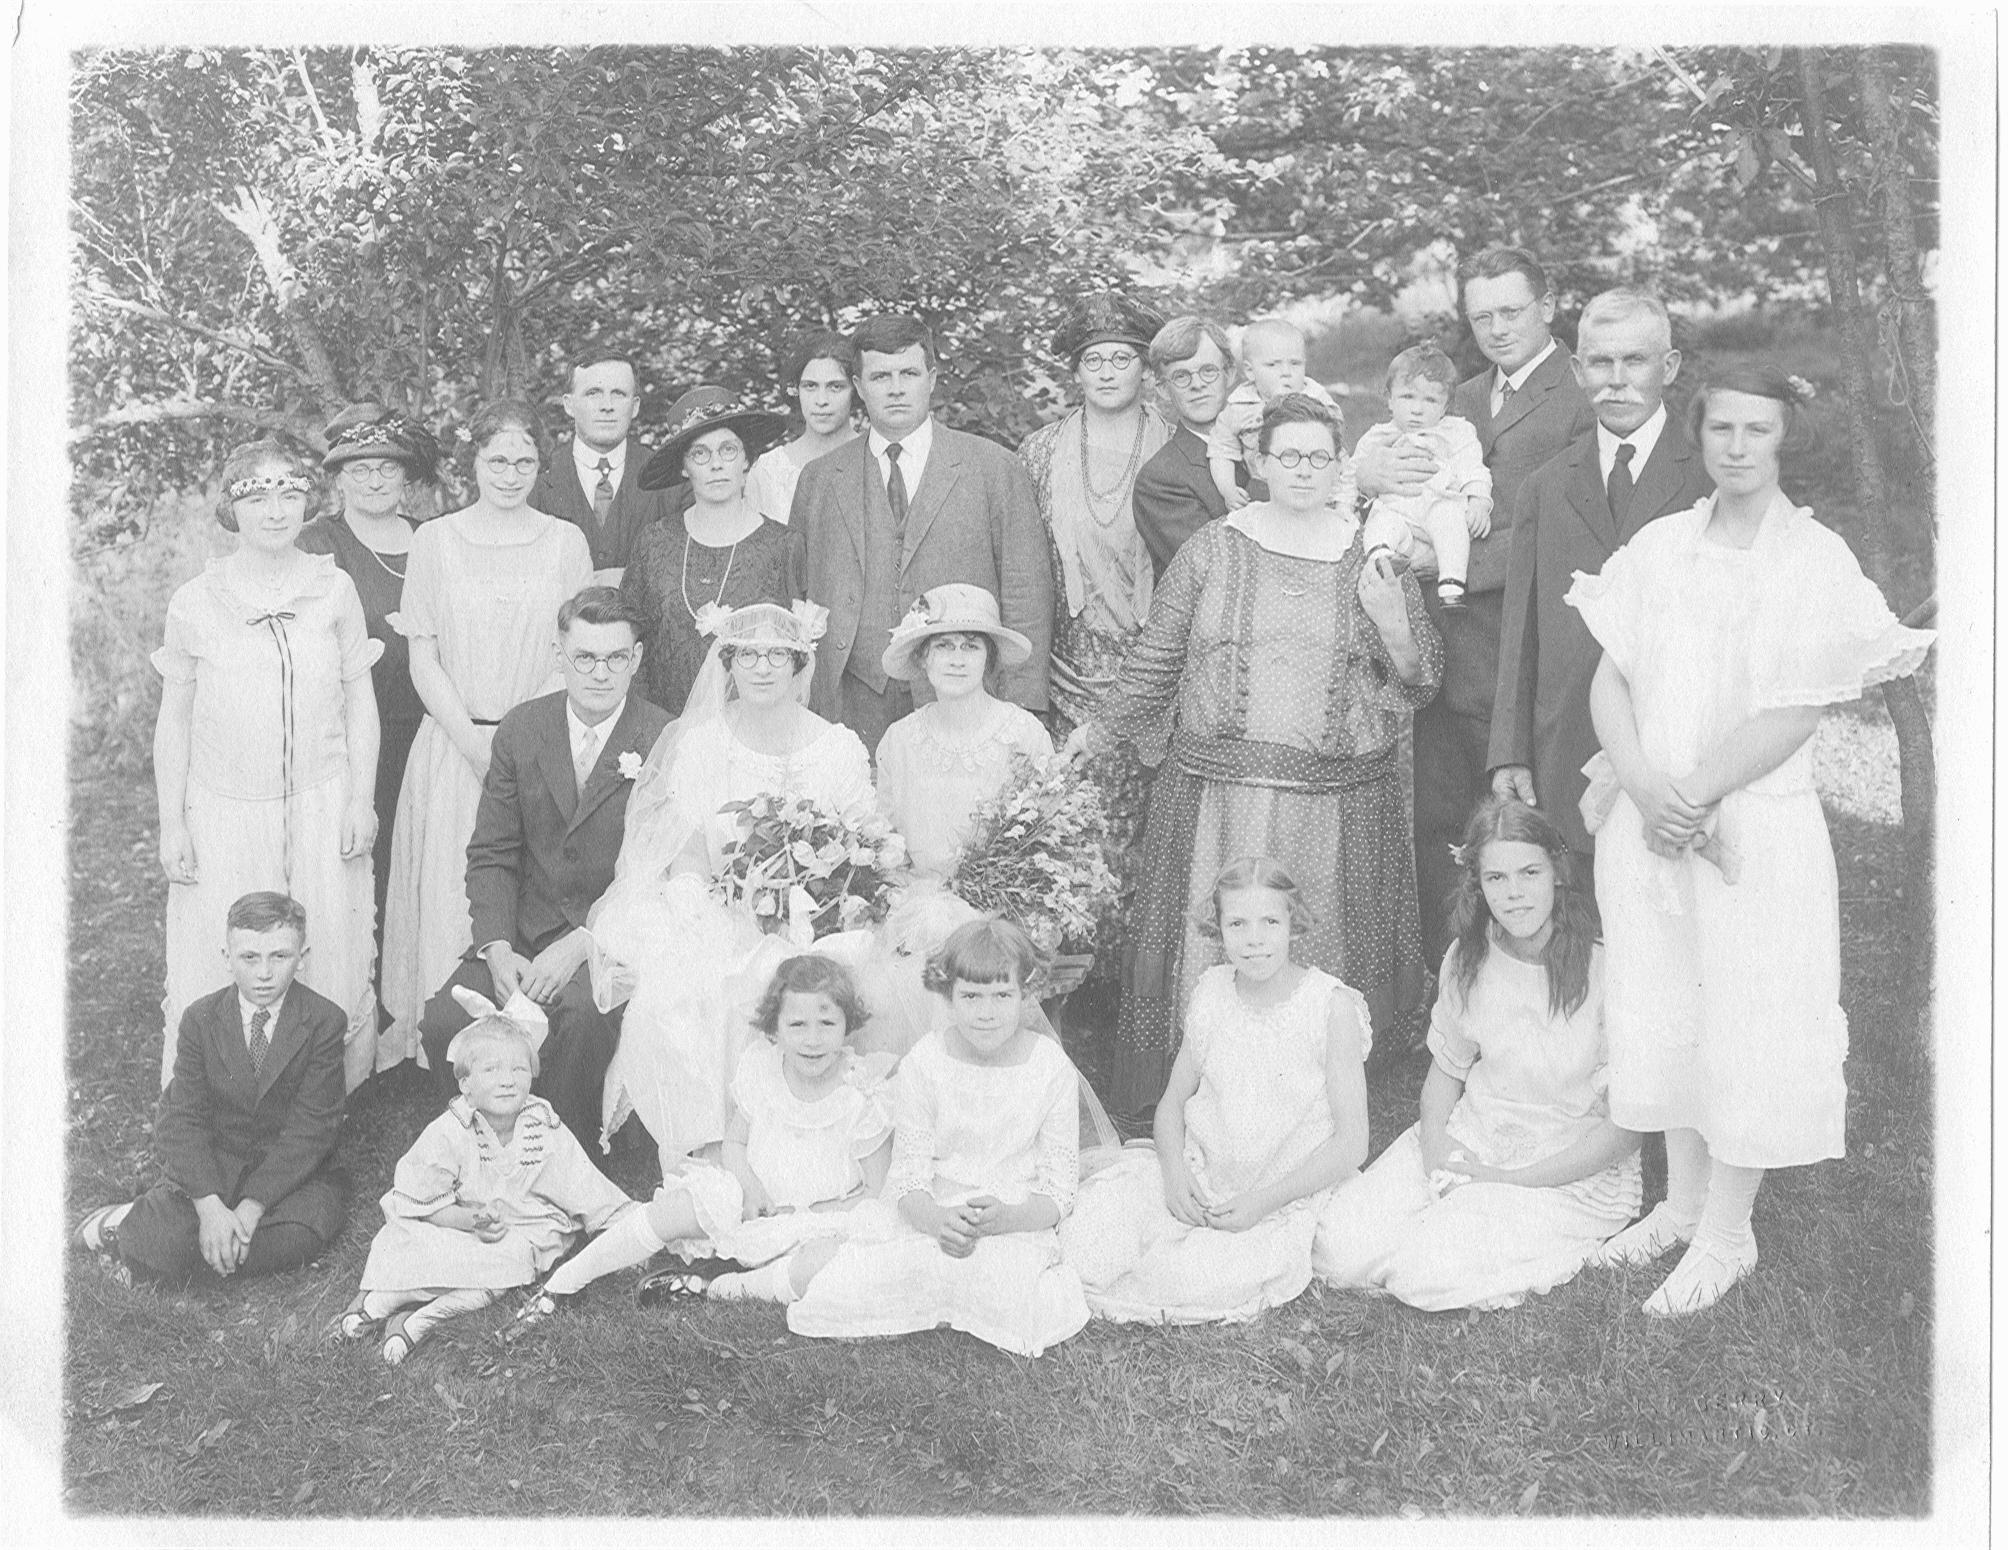 Joseph and Evelyn (Pearl) Estabrooks Wedding